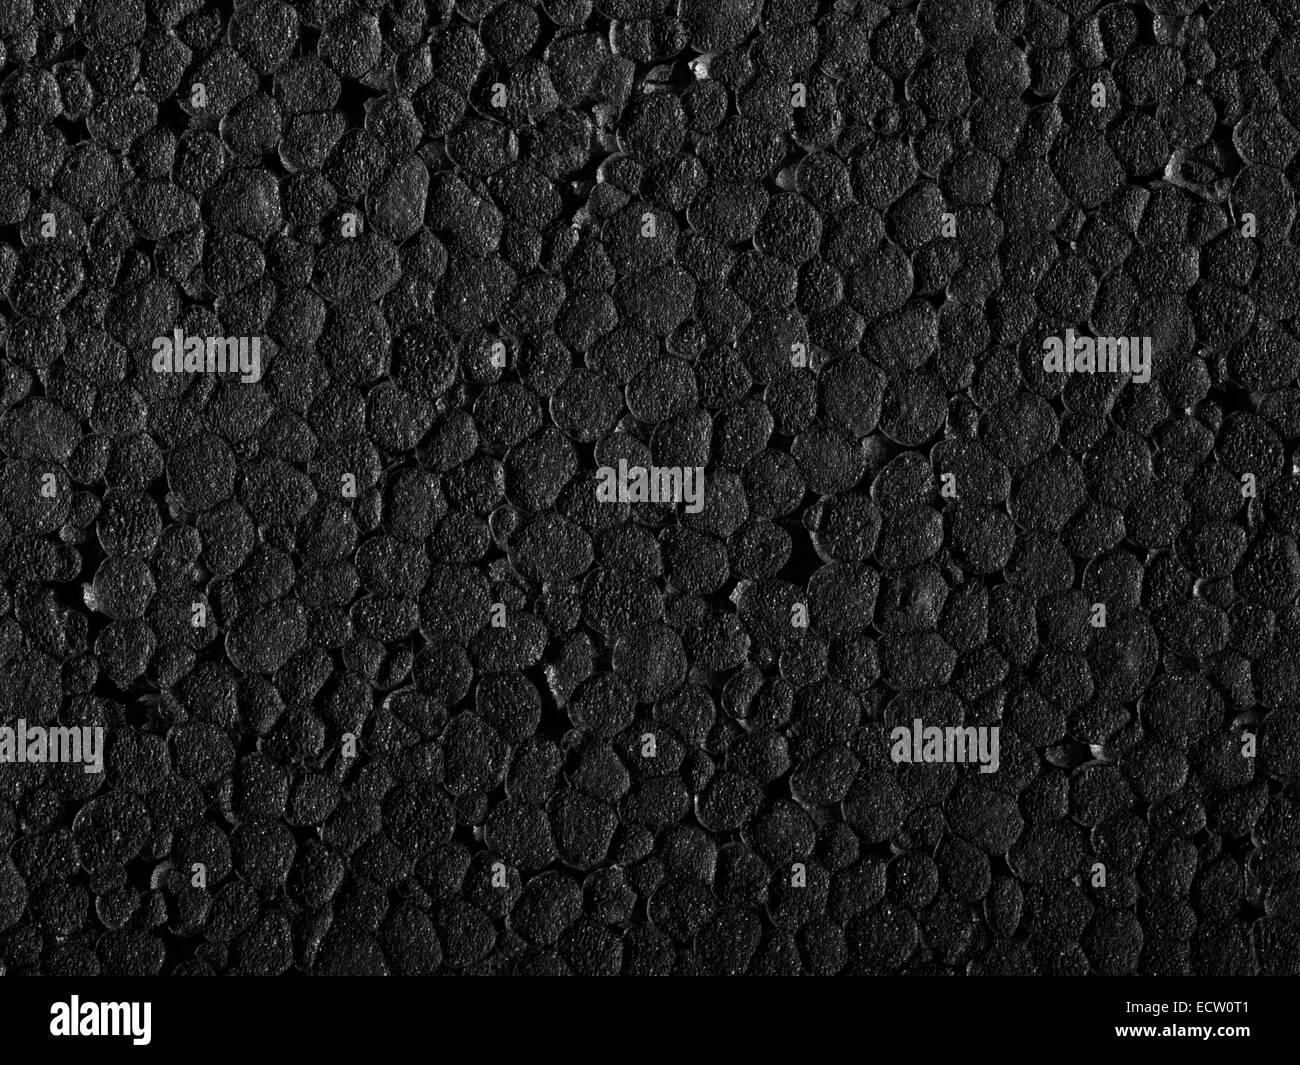 Gros plan plein cadre d'une surface en polystyrène noir Photo Stock